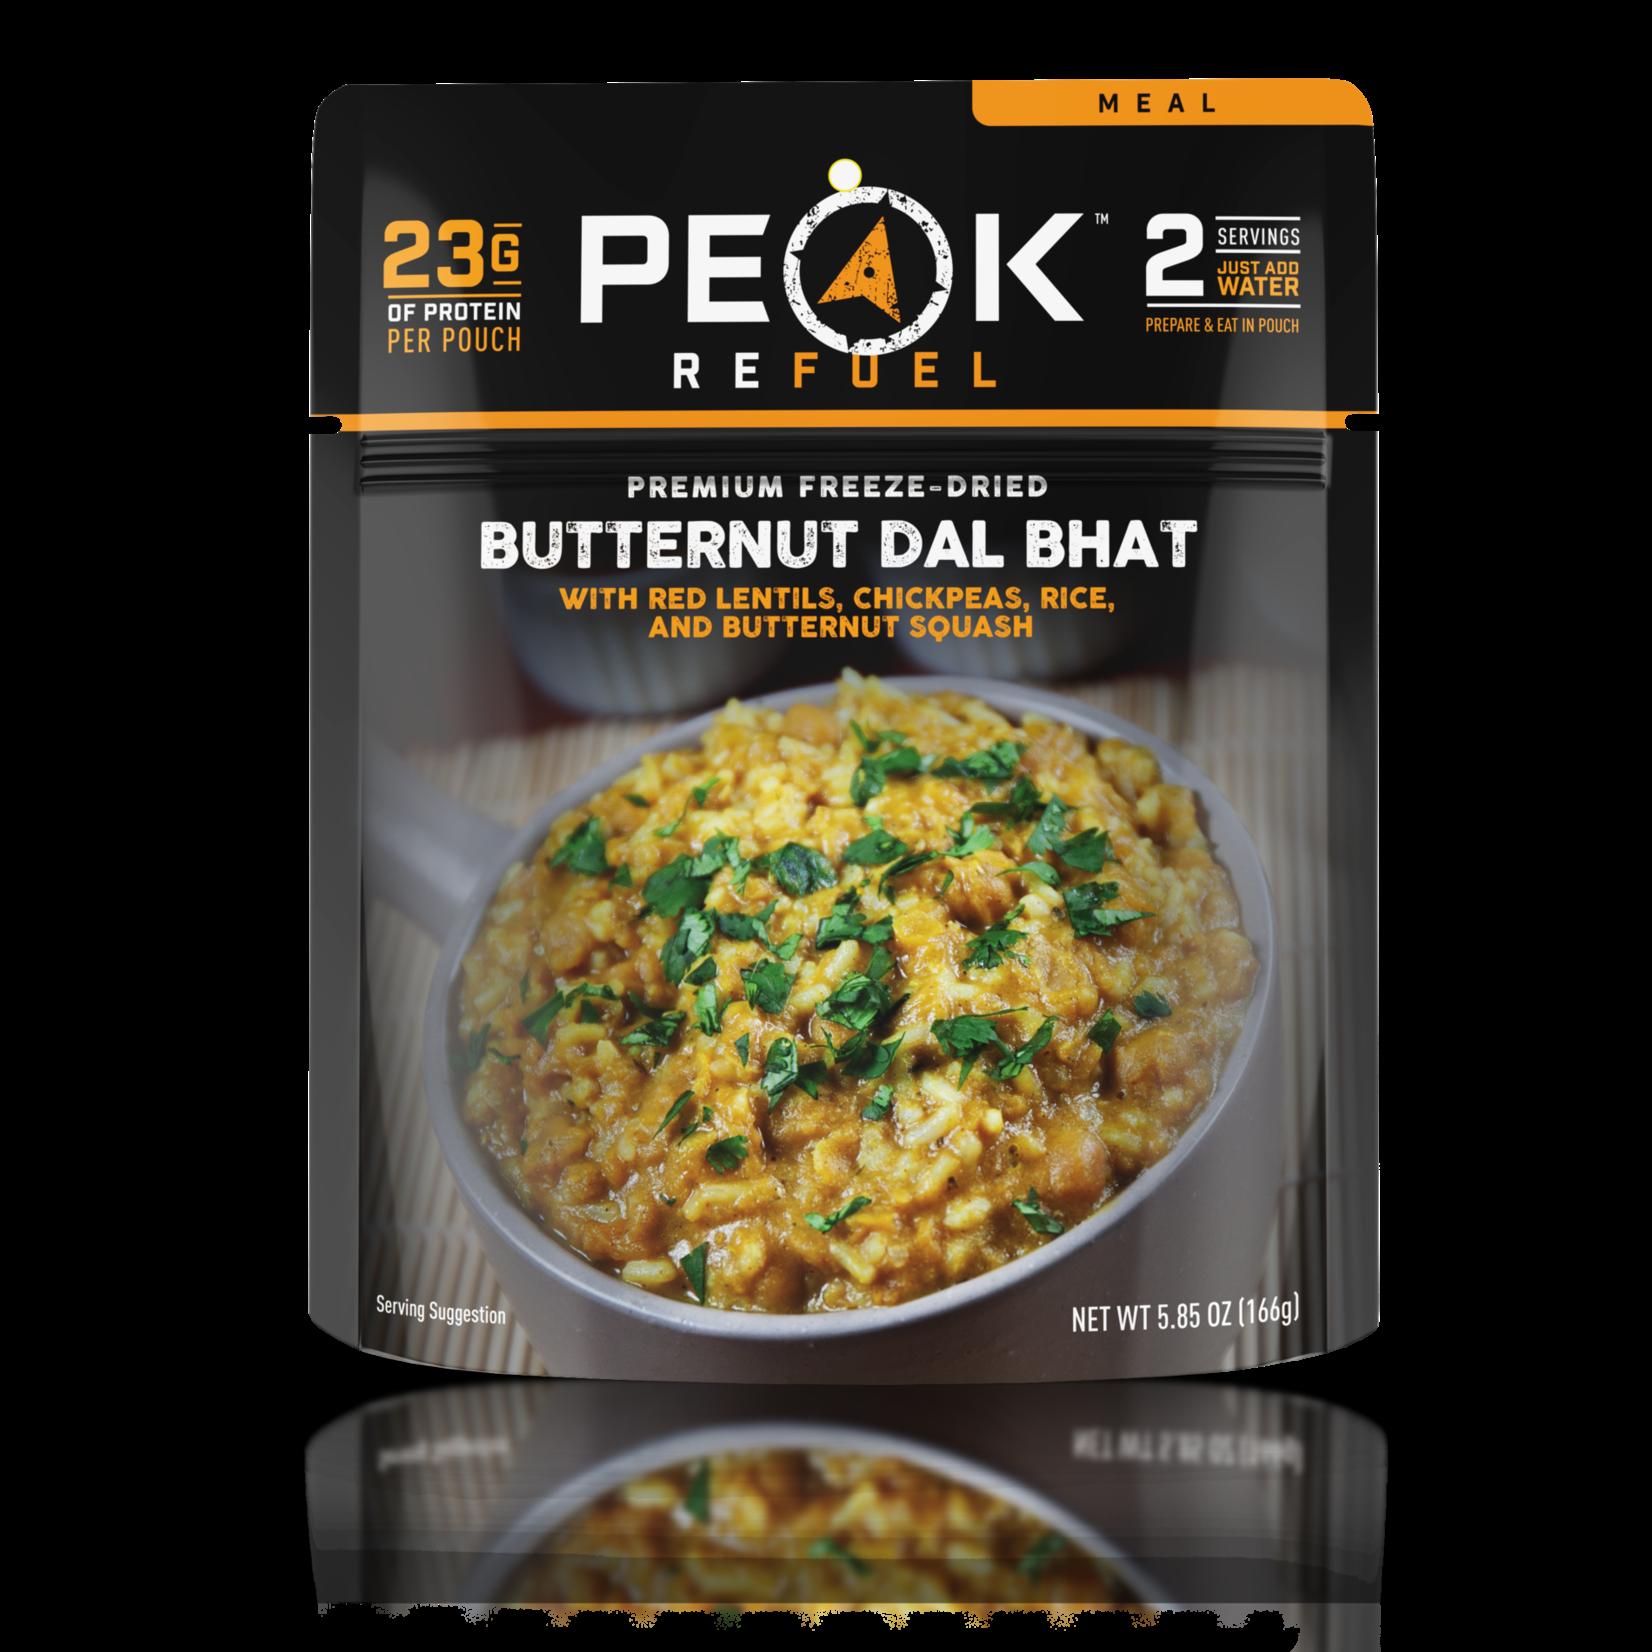 Peak Refuel Peak ReFuel Butternut Dal Bhat Meal (Vegan)